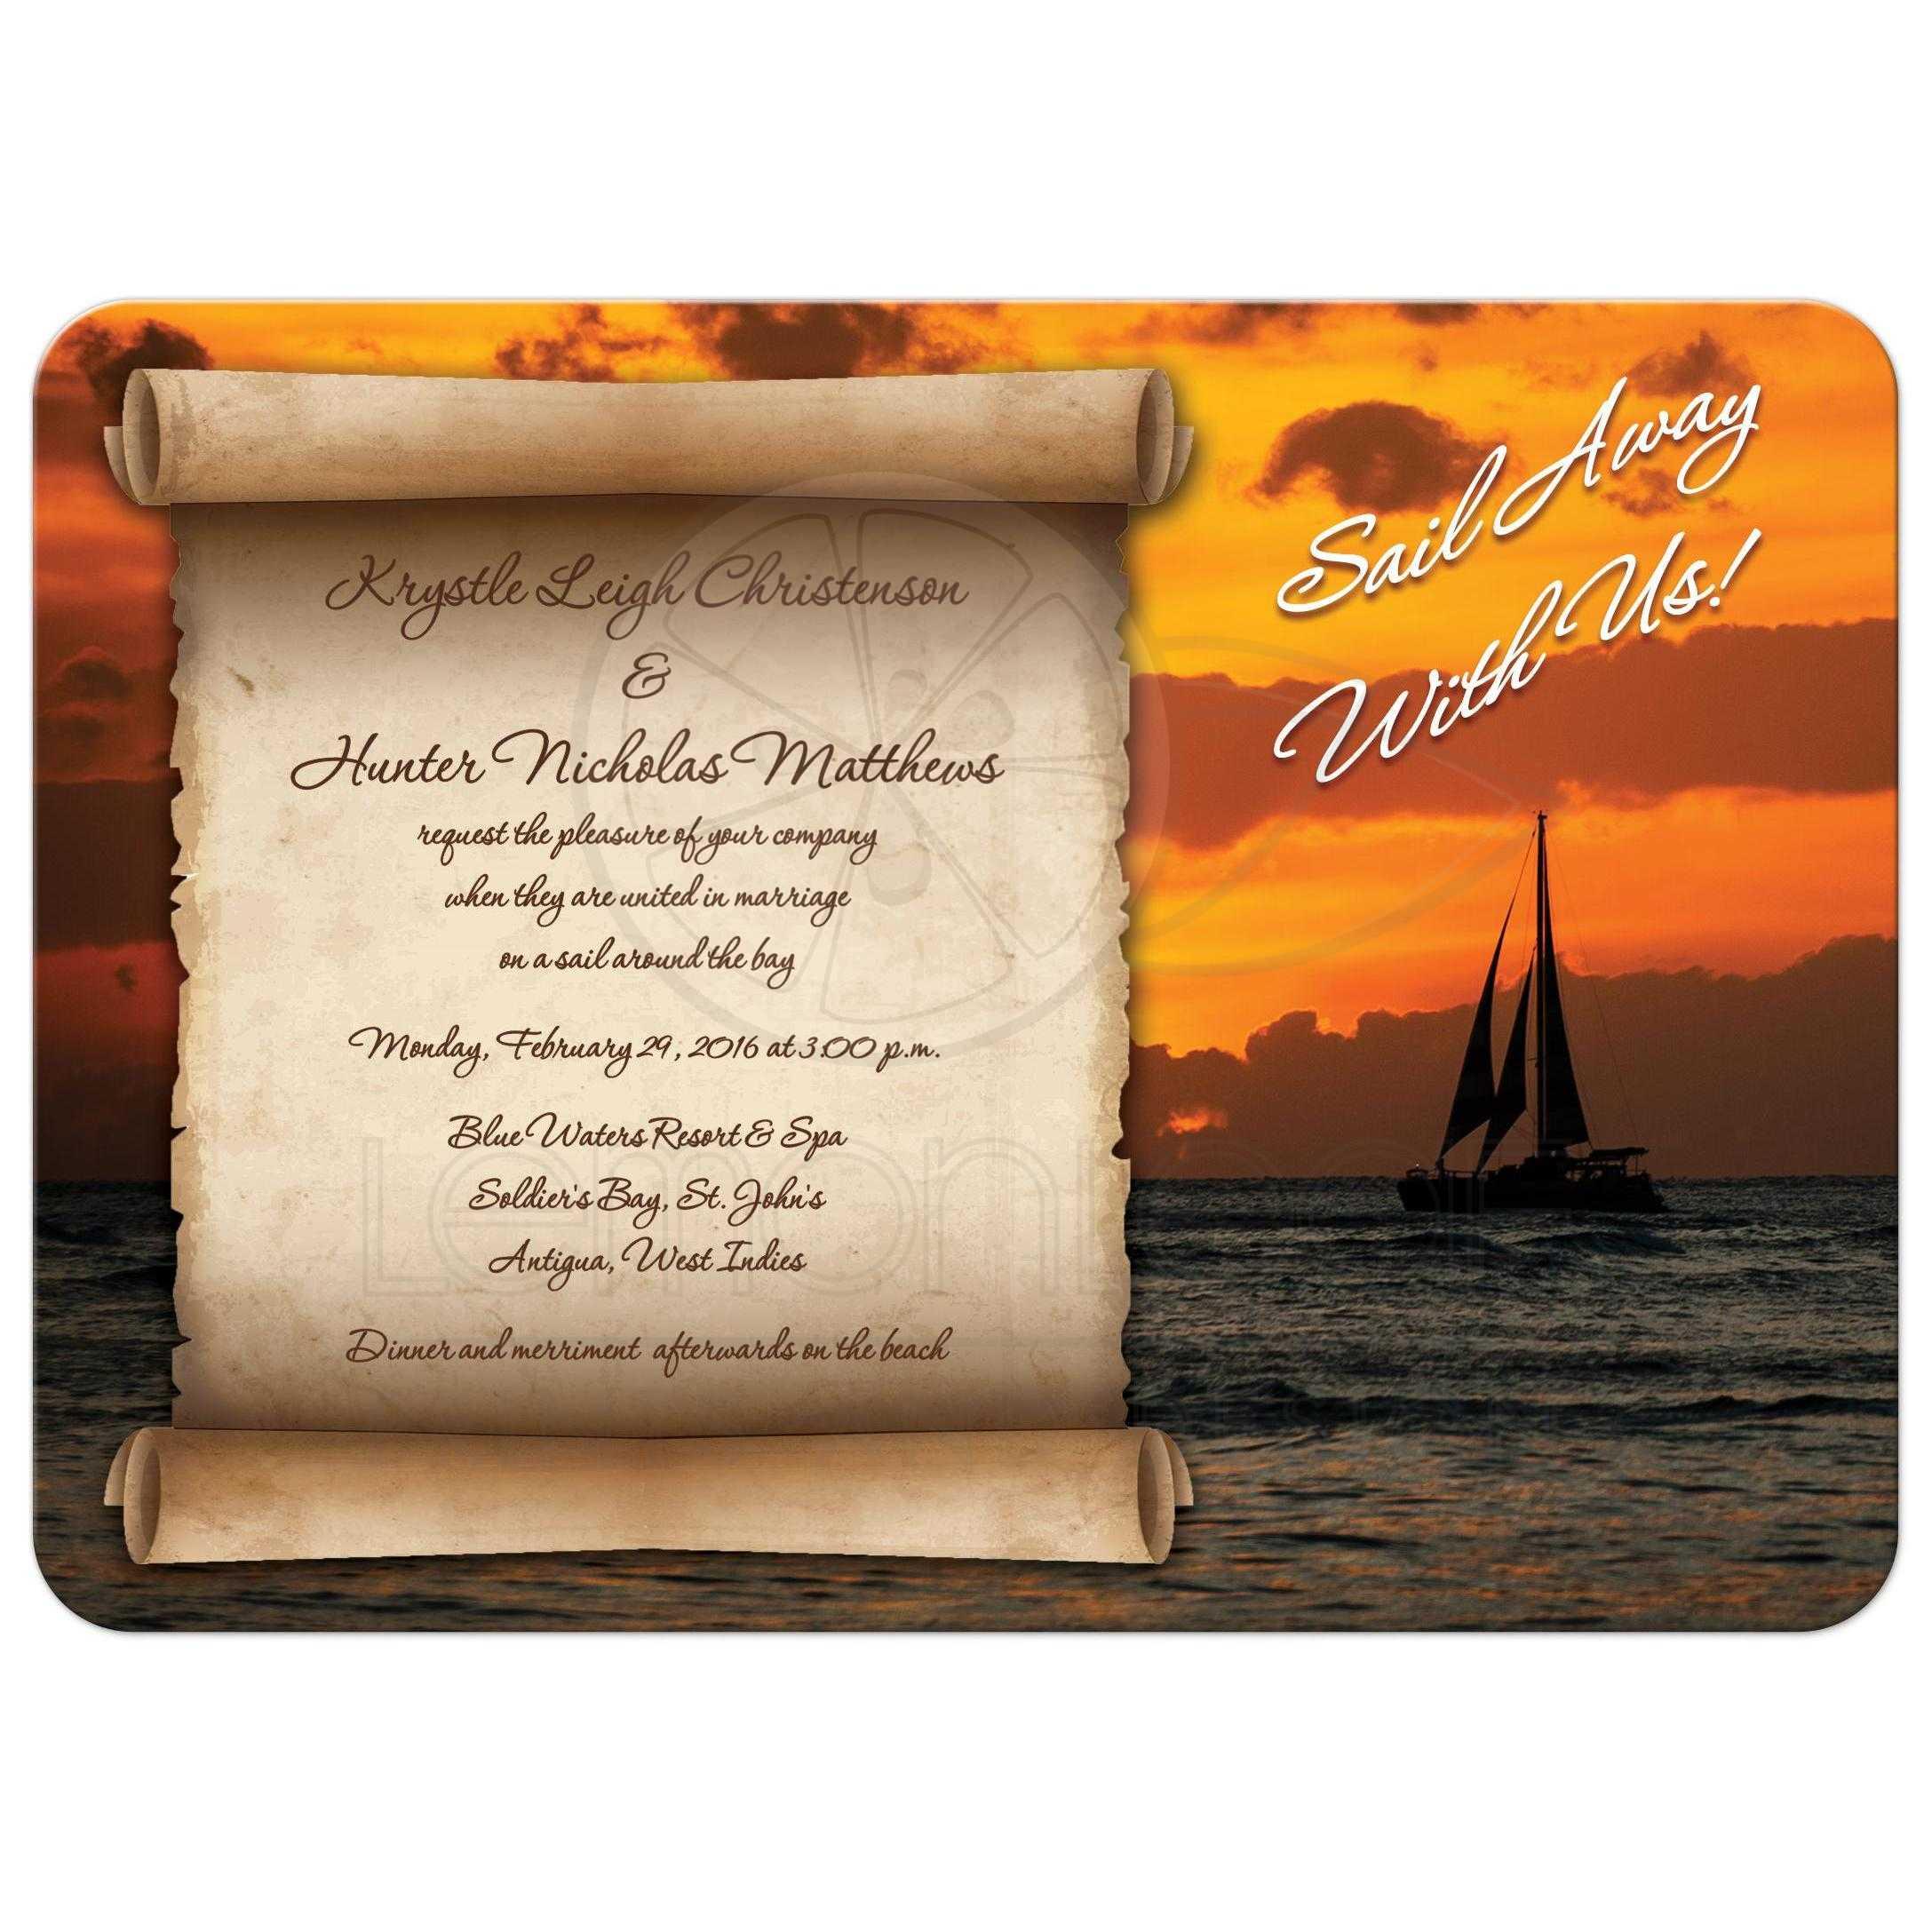 Sailboat Wedding Invitations: Destination Wedding Invitation